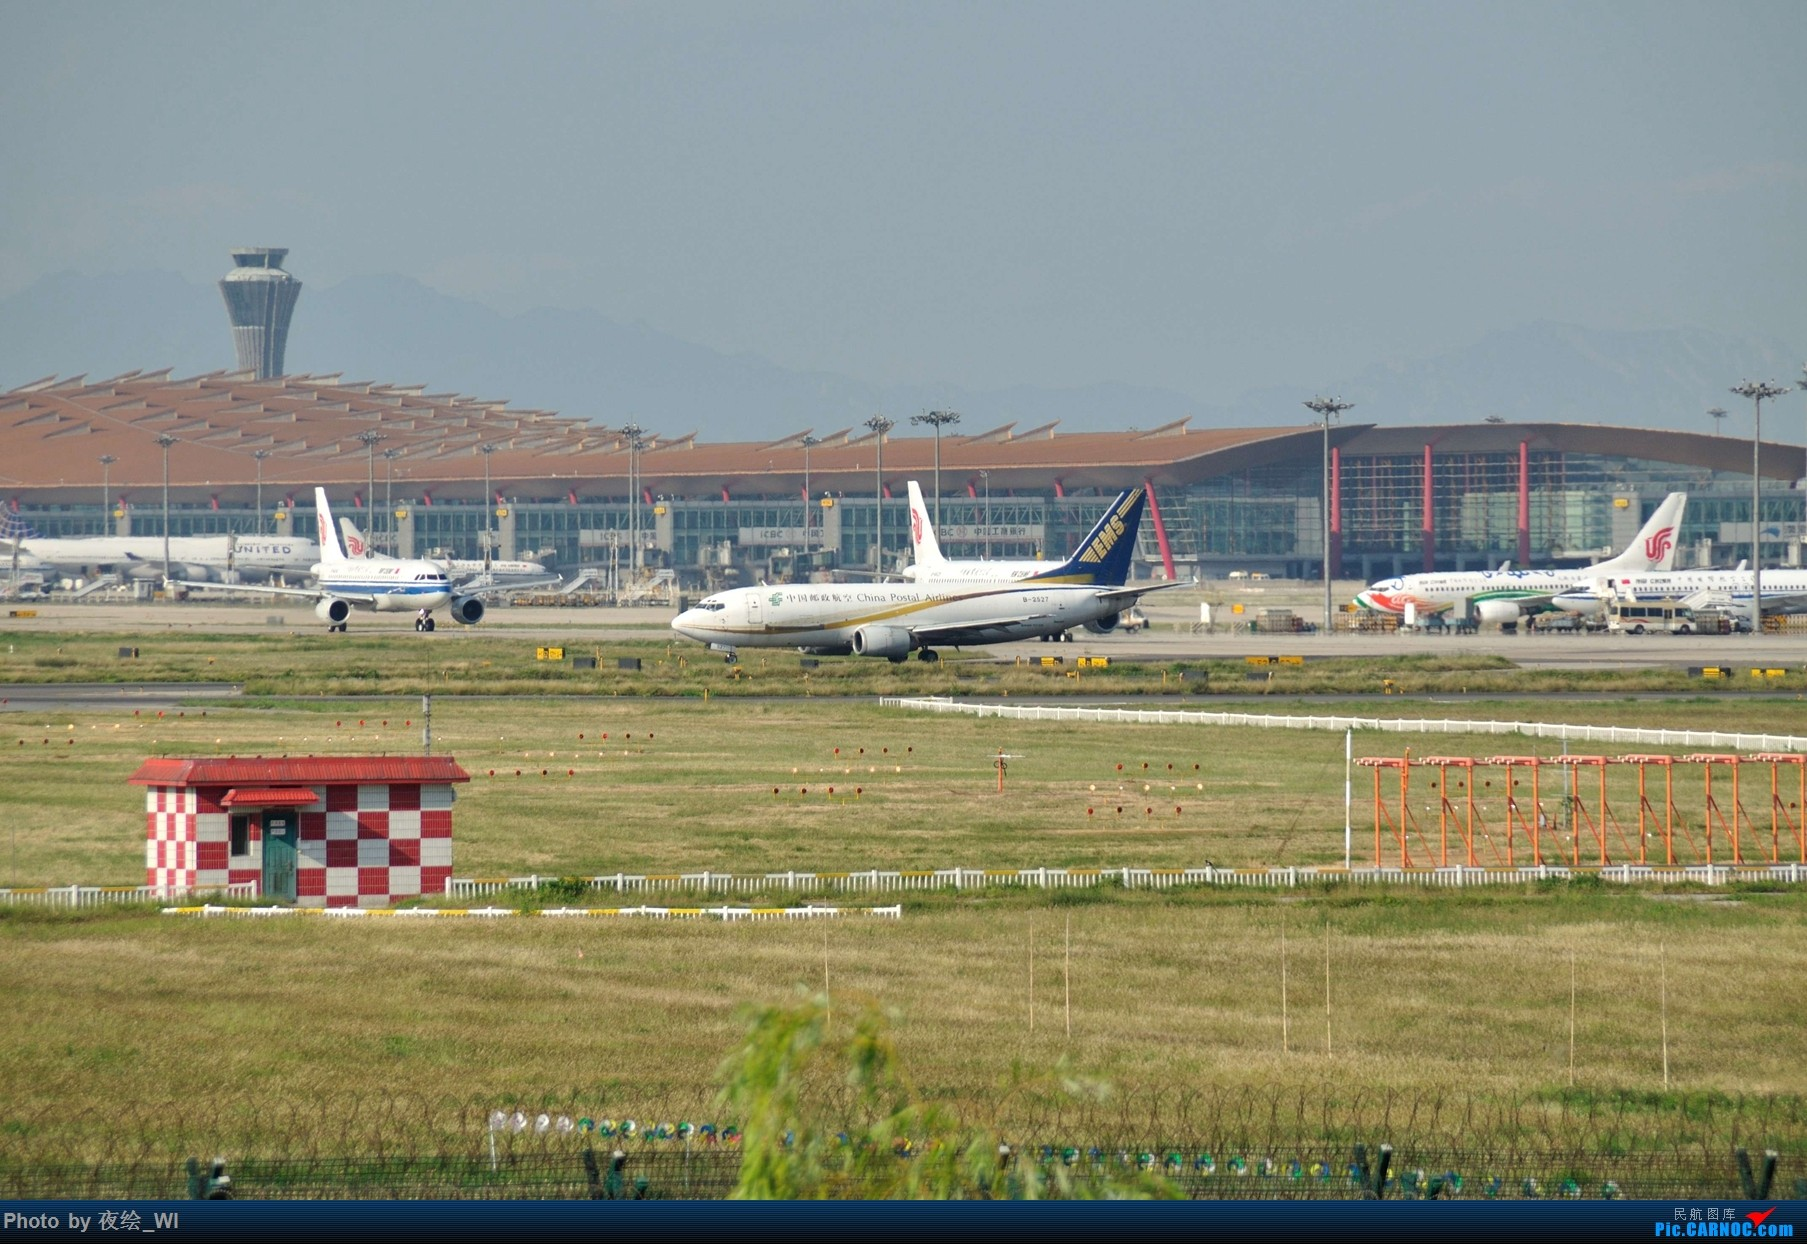 Re:[原创]【PEK】初刷八卦台,拍得飞起! BOEING 737-300 B-2527 中国北京首都国际机场